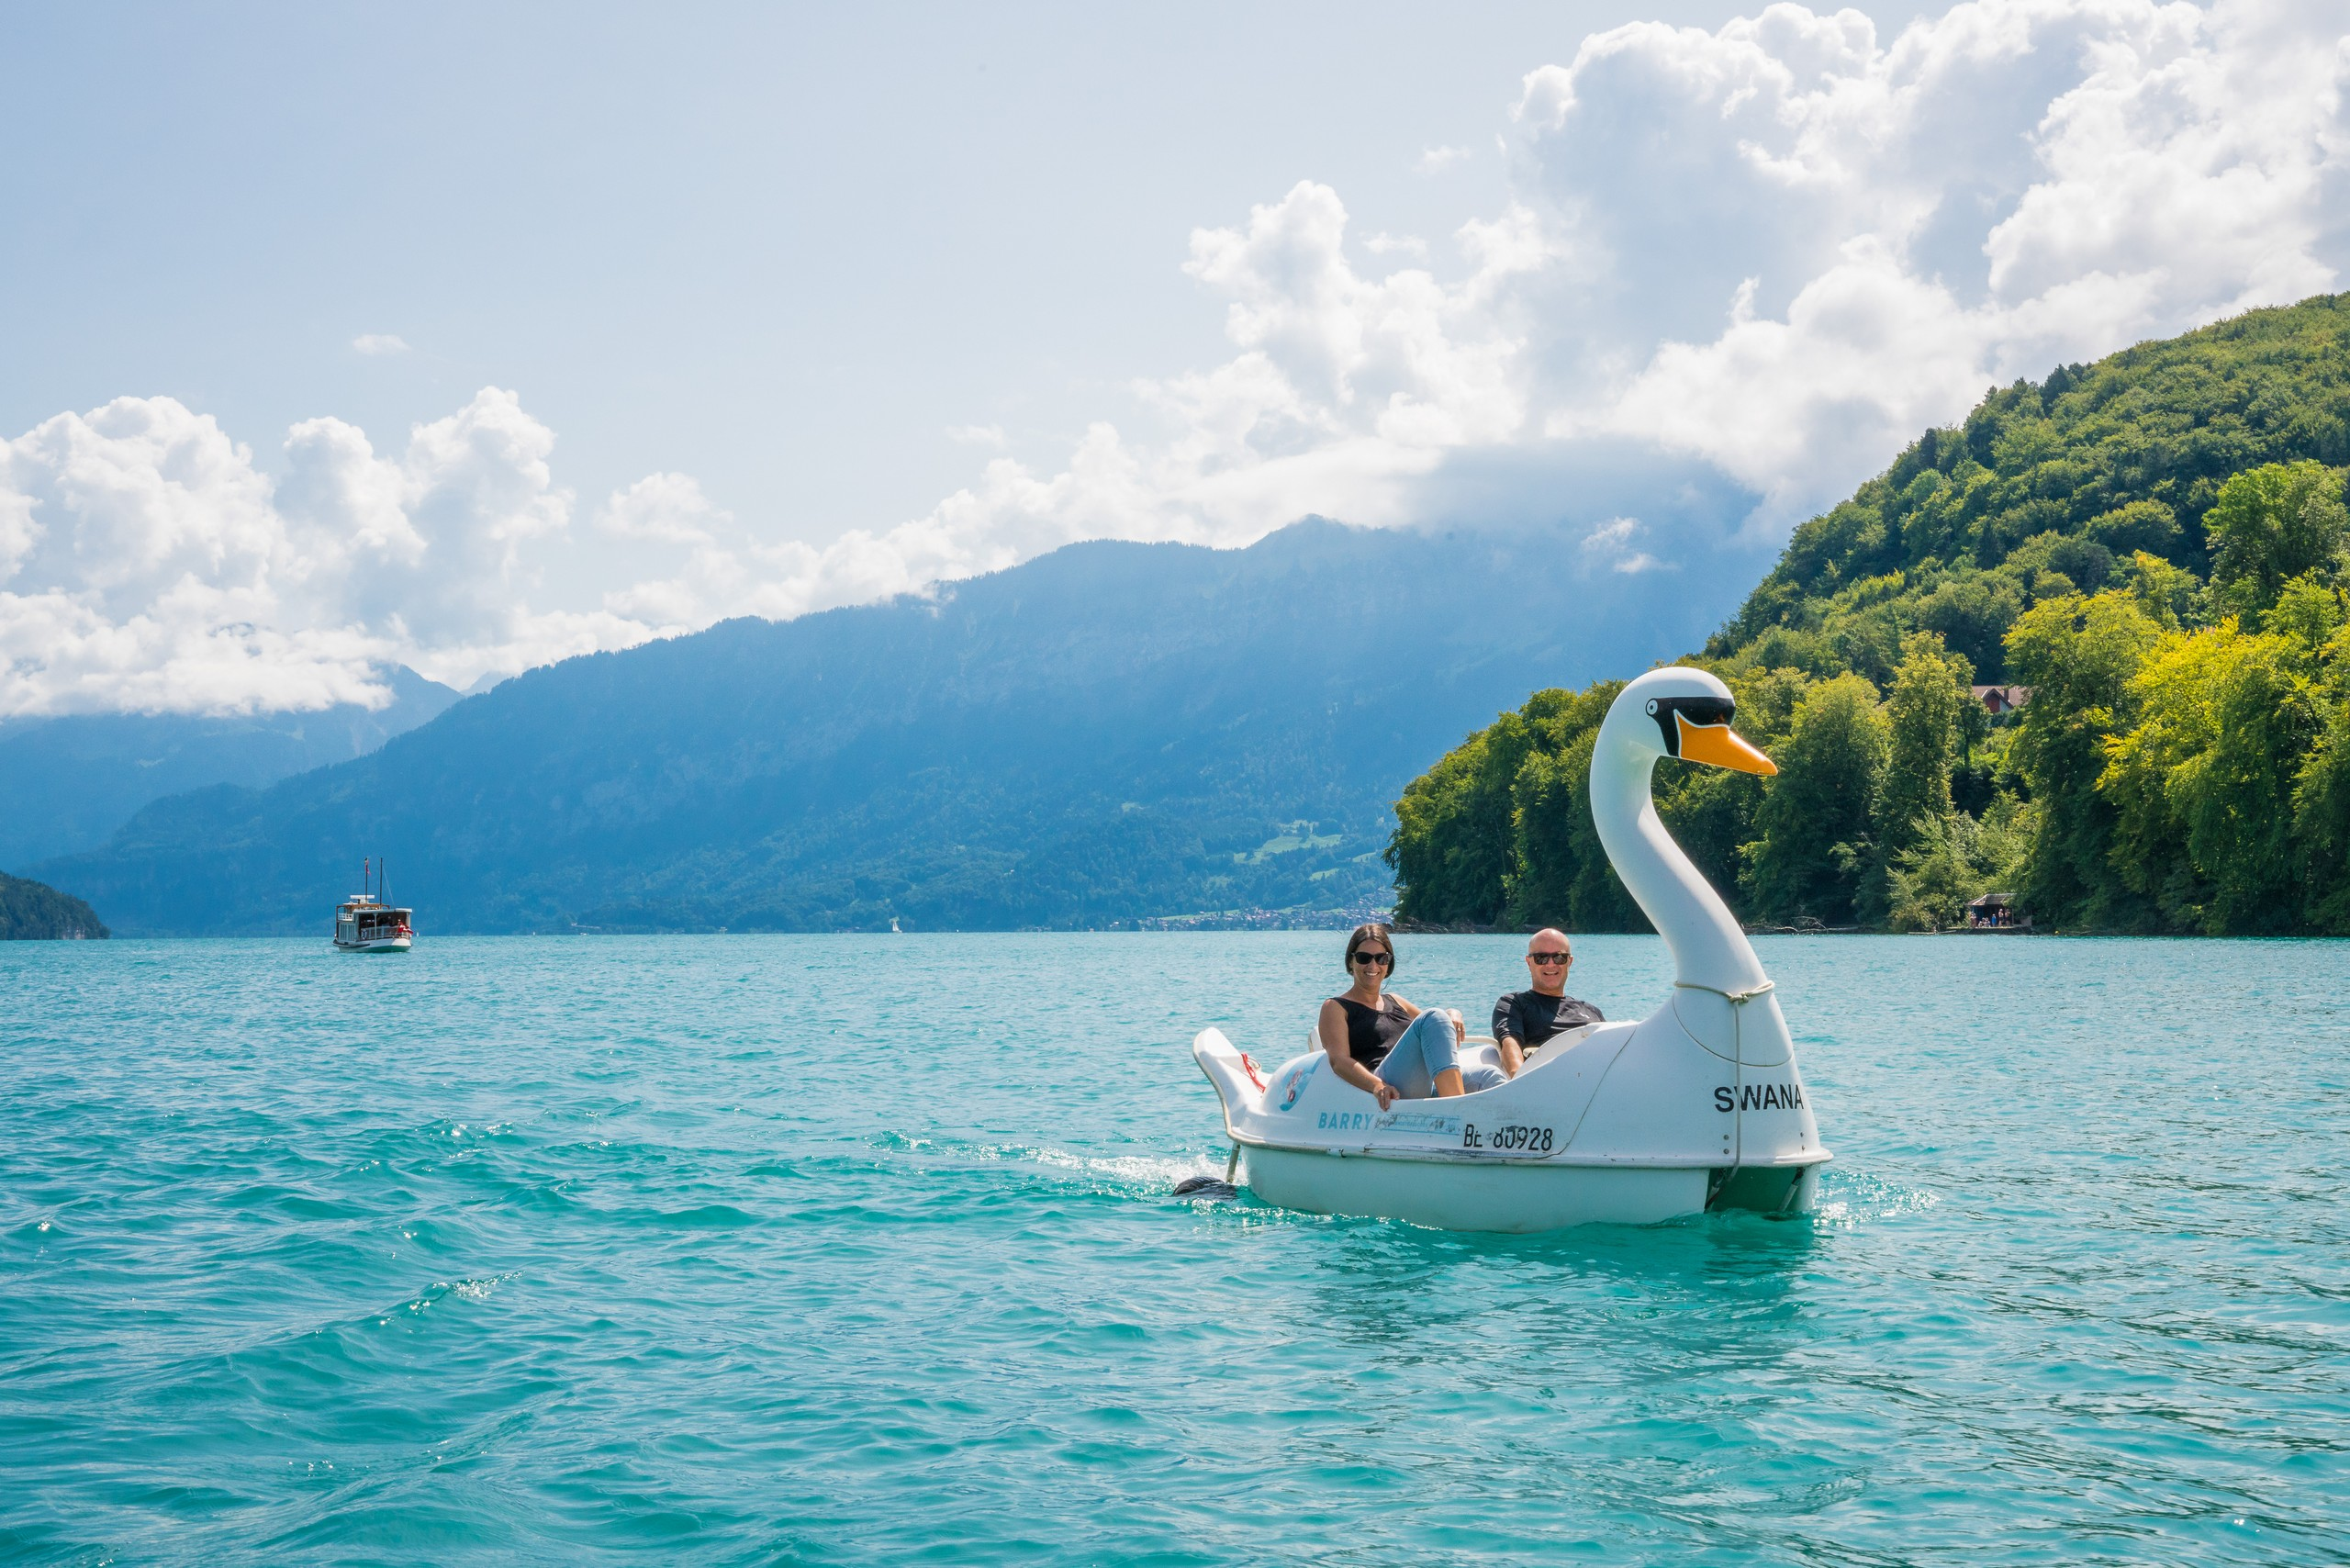 spiez-schwanenpedalo-sommer-thunersee-paar-ausflug-tiefblau-geniessen-boot-pedalo